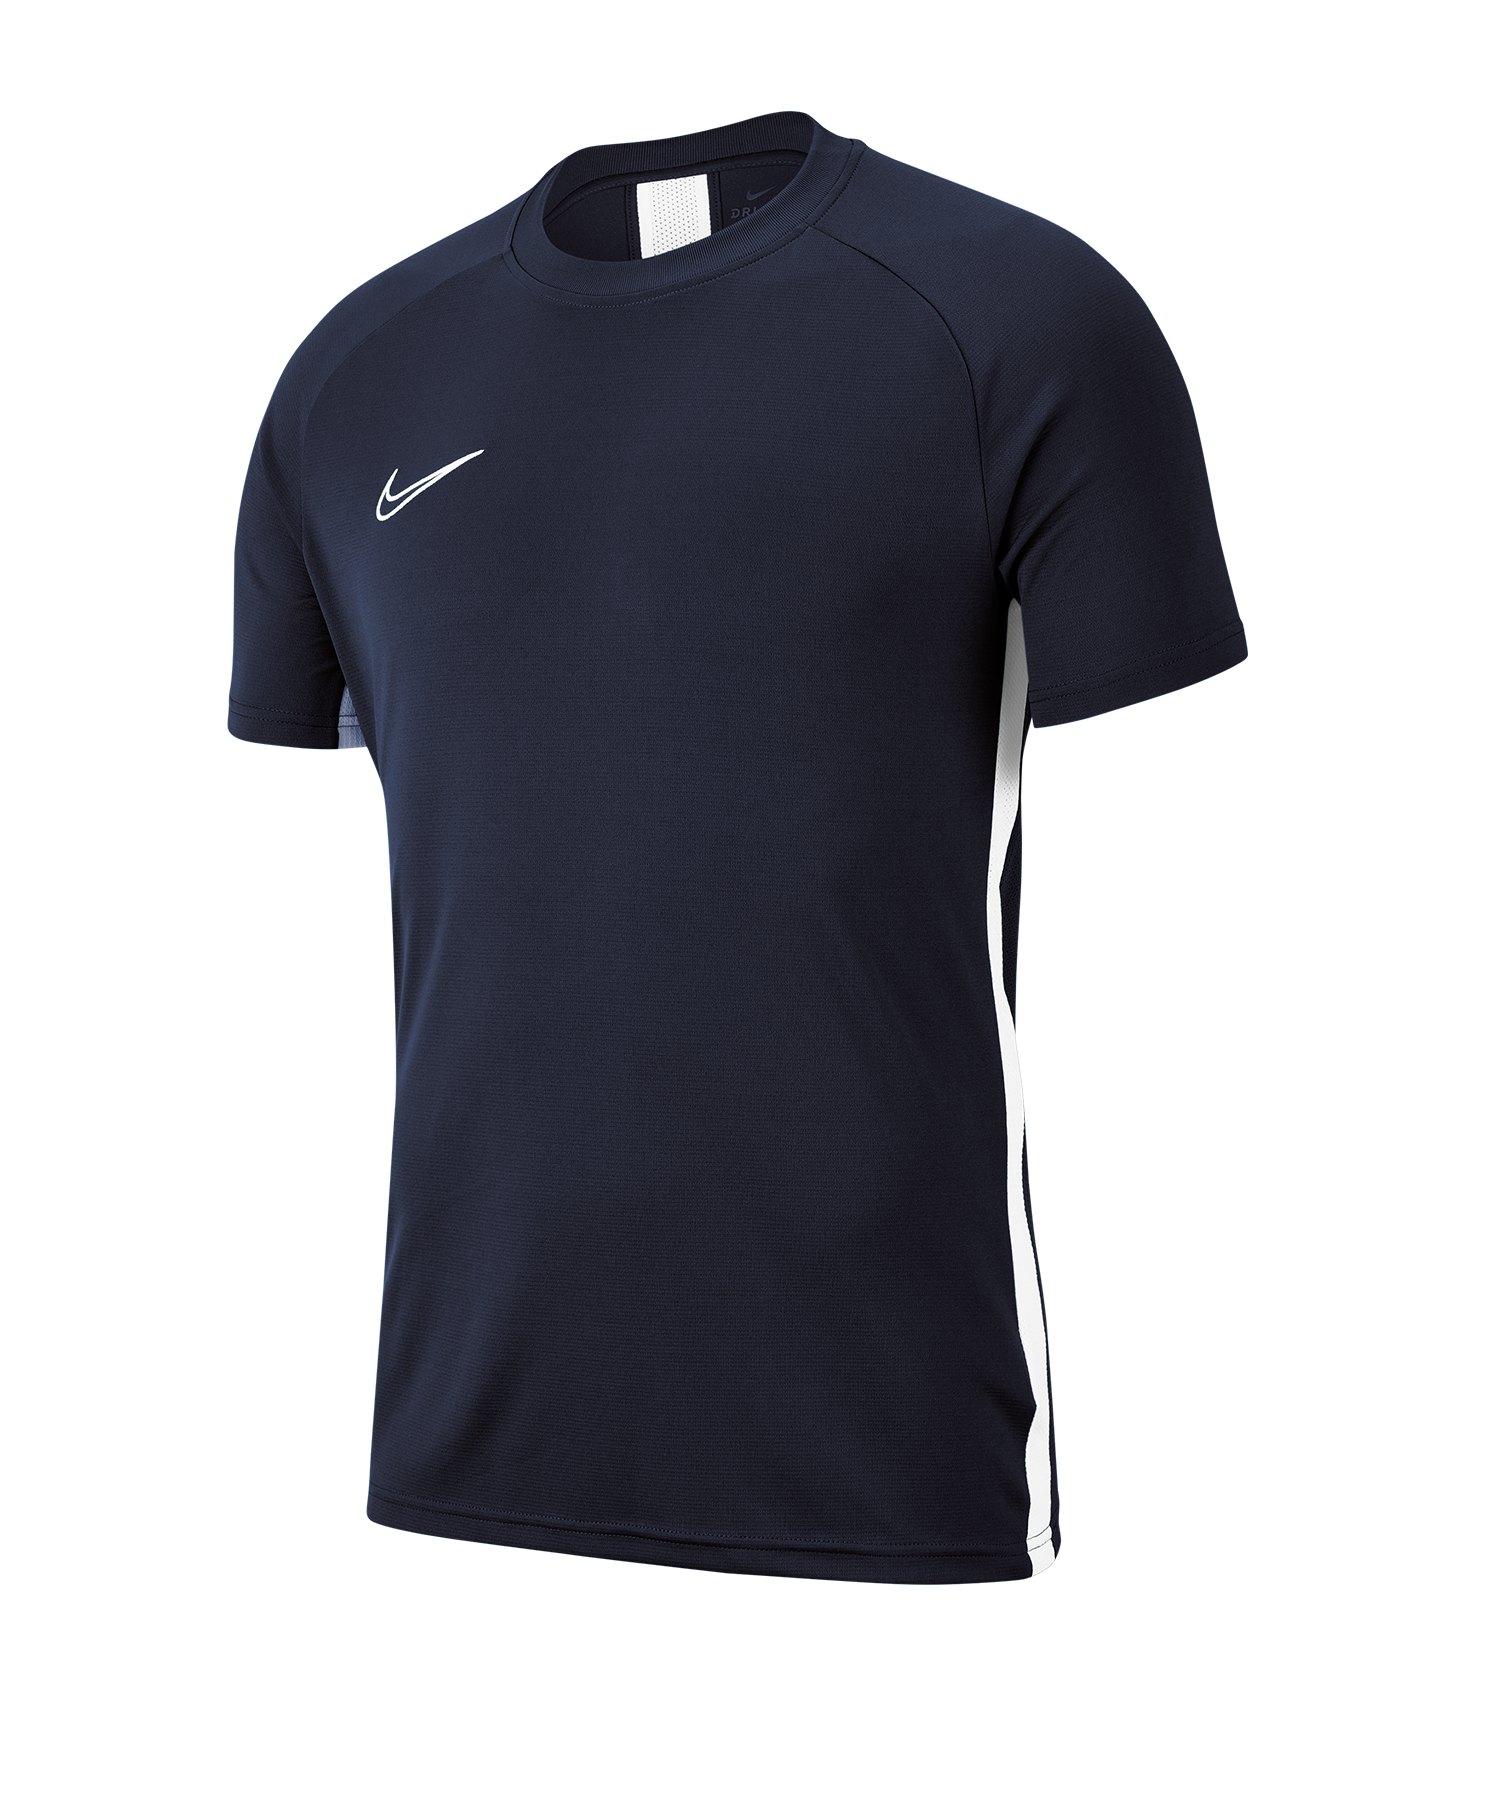 Nike Academy 19 Trainingstop T-Shirt Blau F451 - blau